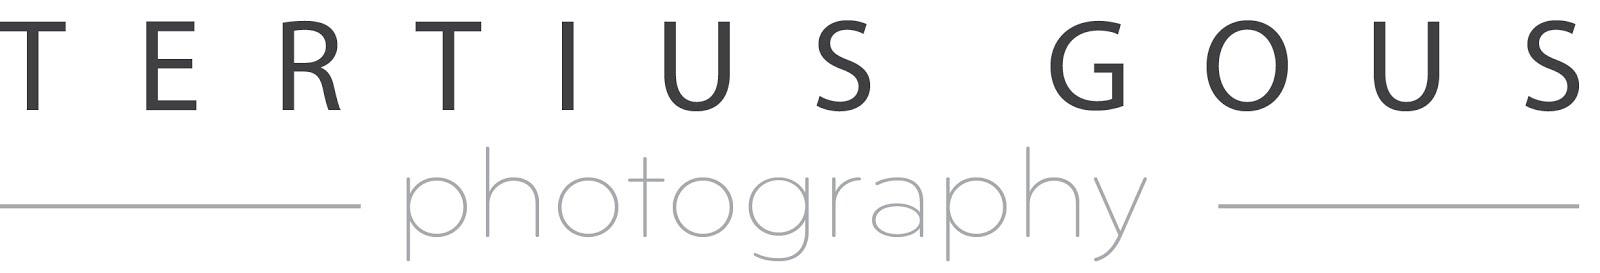 TERTIUS GOUS Photography